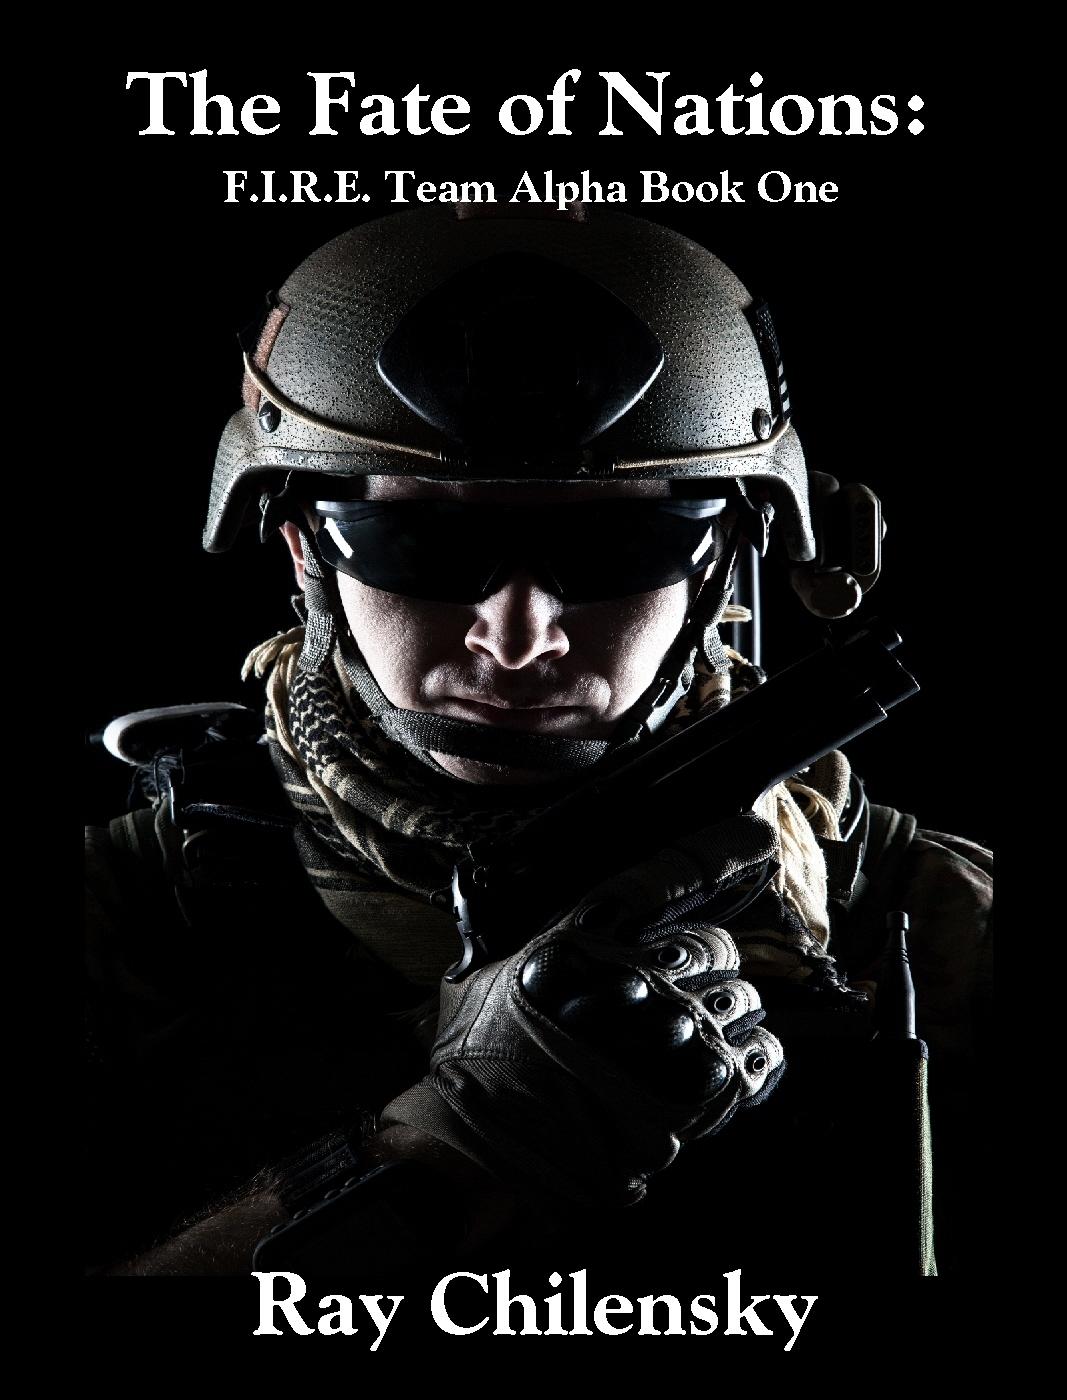 The Fate of Nations : F.I.R.E. Team Alpha Book One